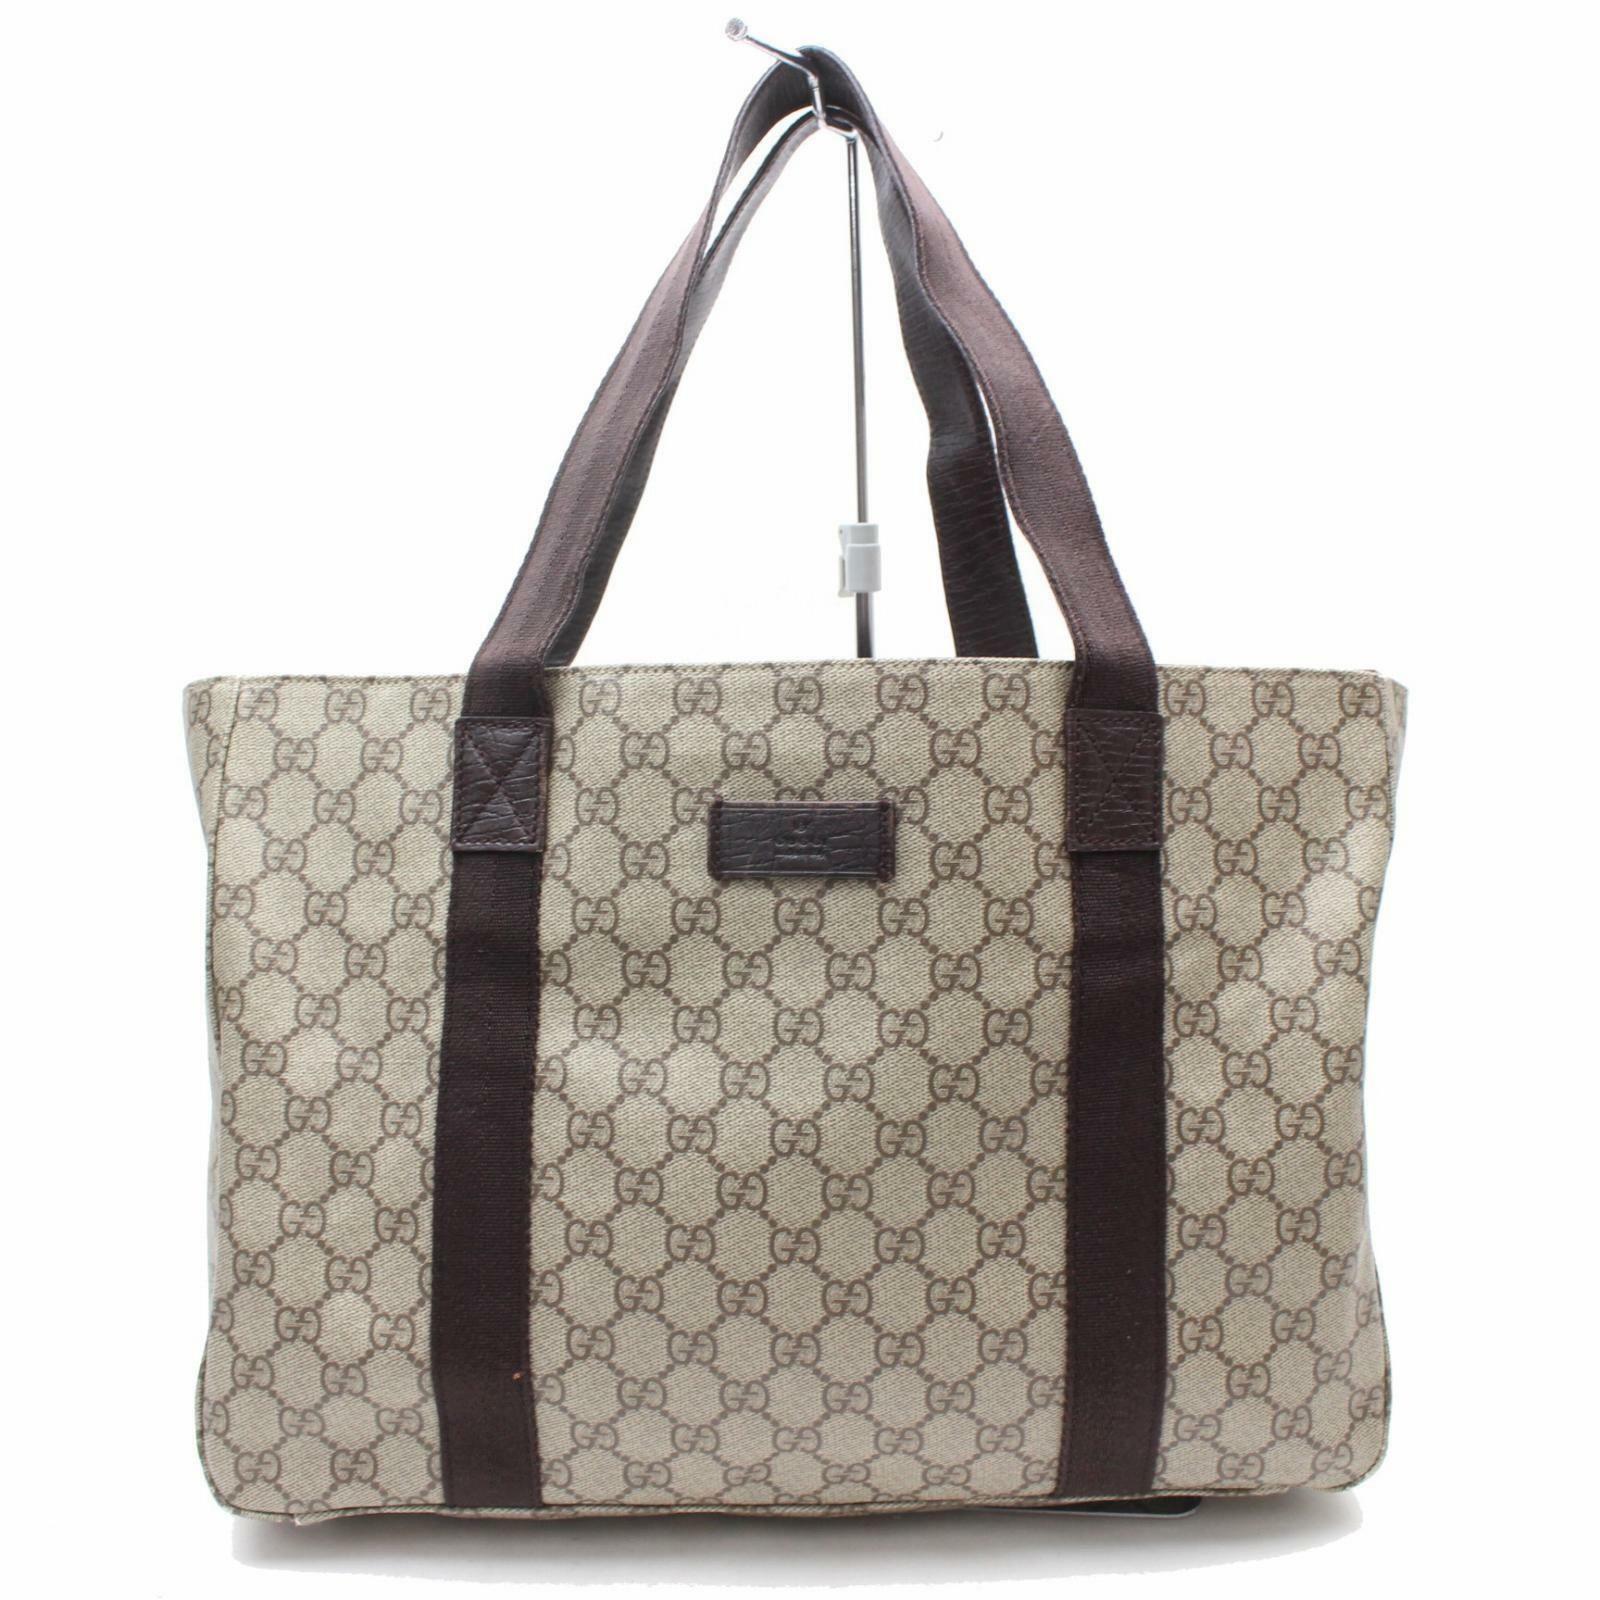 221ea3b3ff41 Details about Authentic GUCCI GG Plus Tote Bag Handbag PVC in 2019 ...